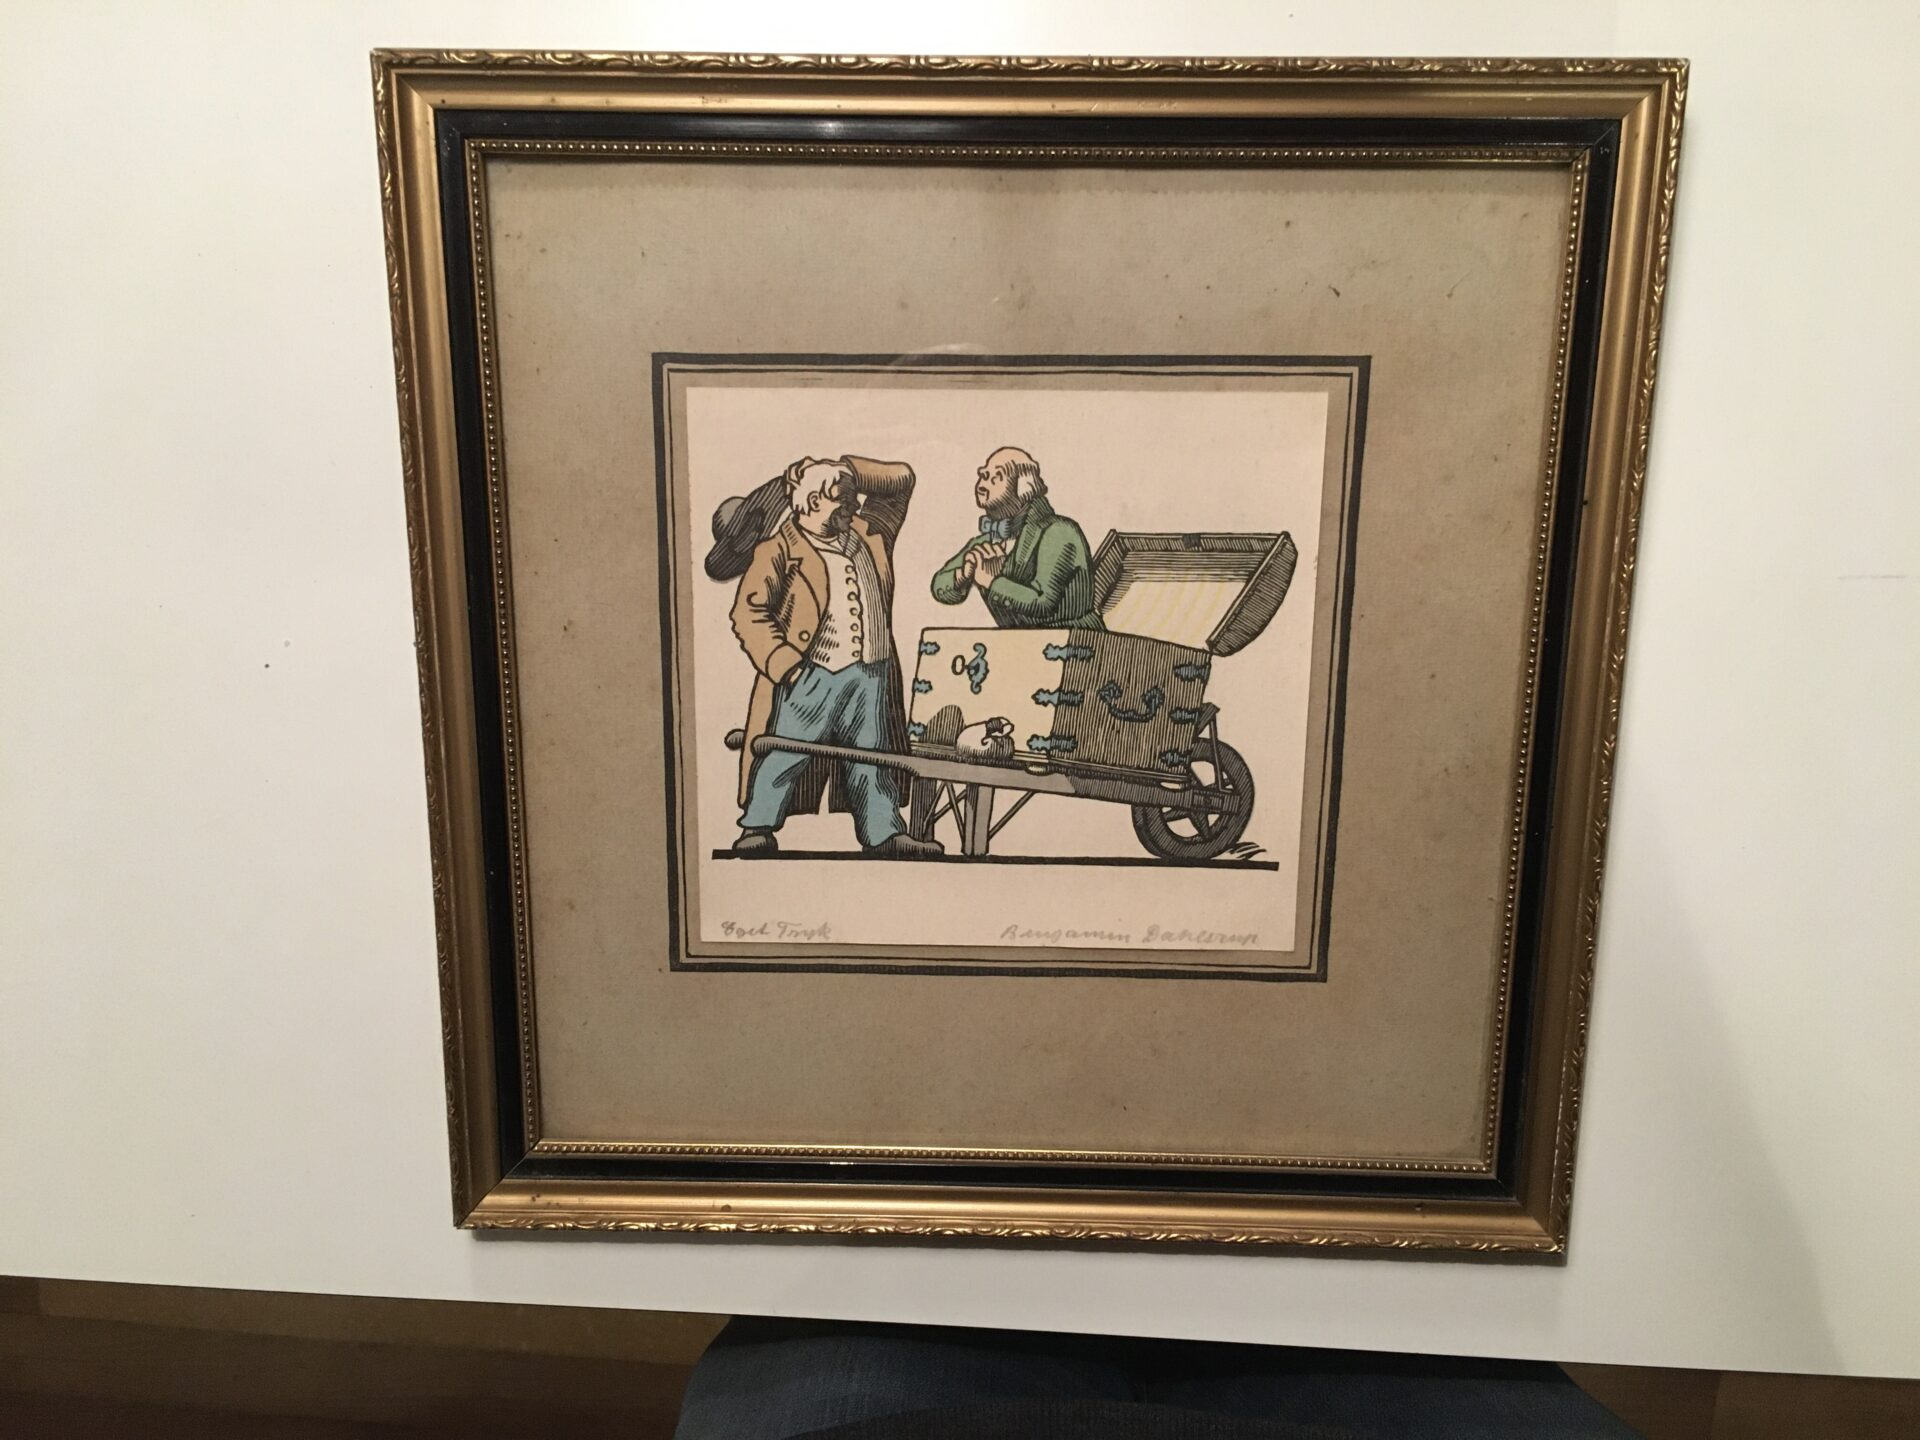 Benjamin Dahlerup, signert i bly, eget tryk, rammemål 28x28 cm,pris 300kr